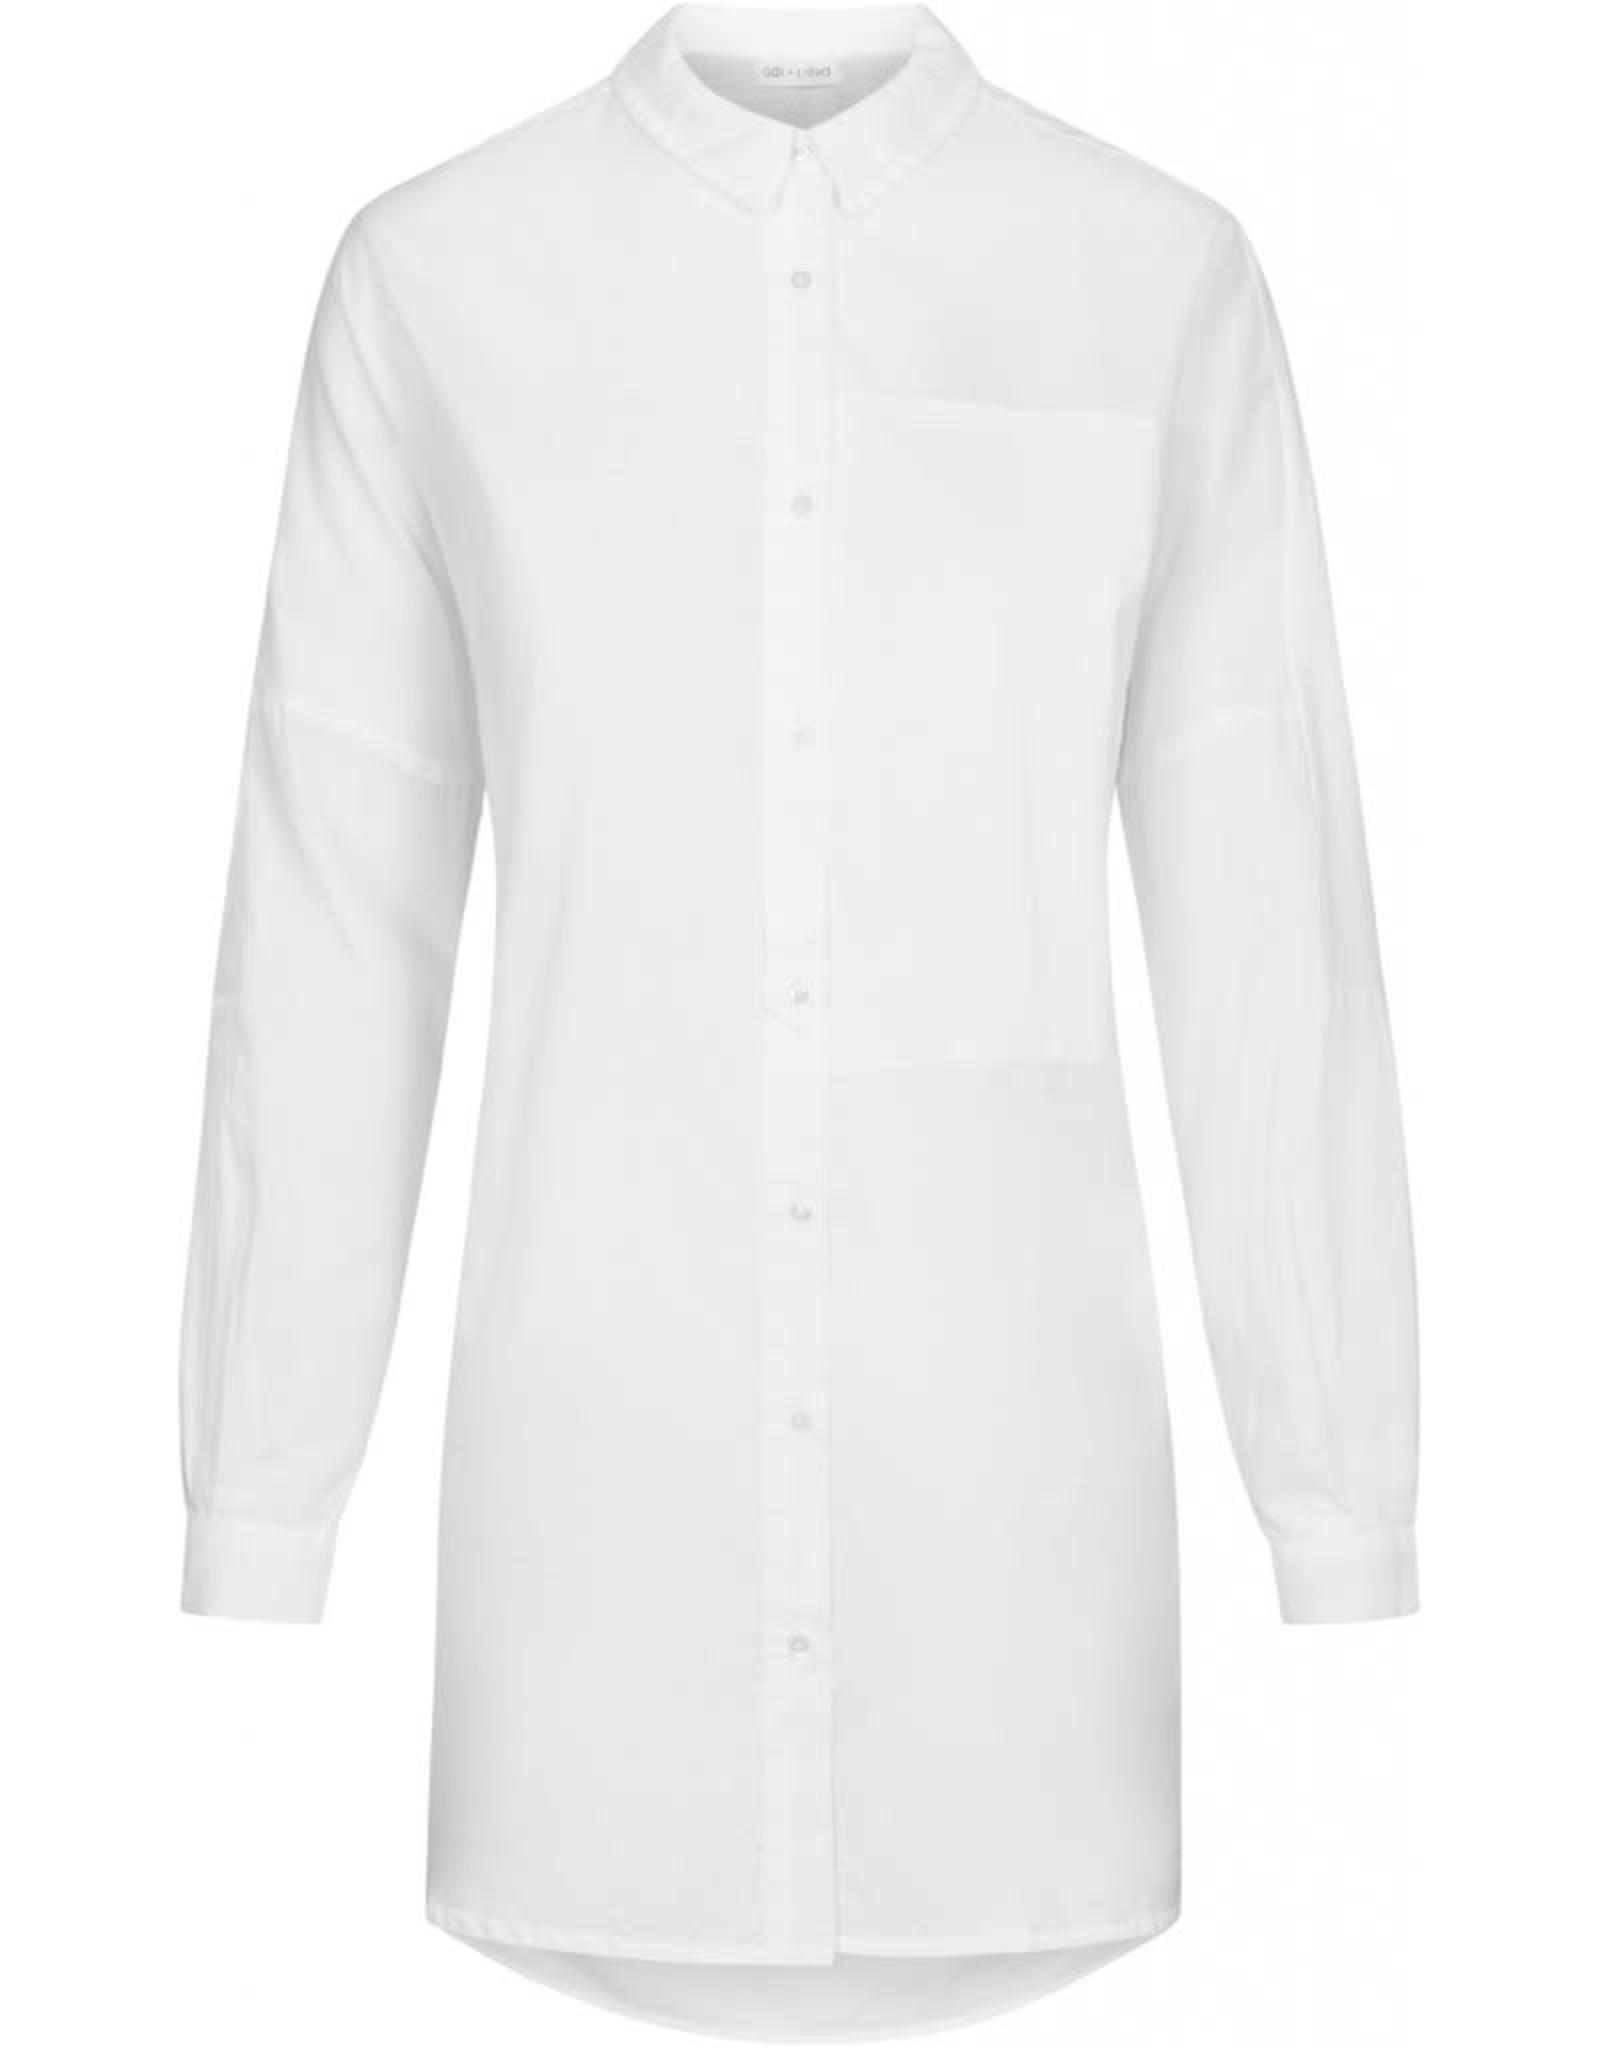 Gai&Lisva tuniek / blouse 'Annie' organisch katoen wit